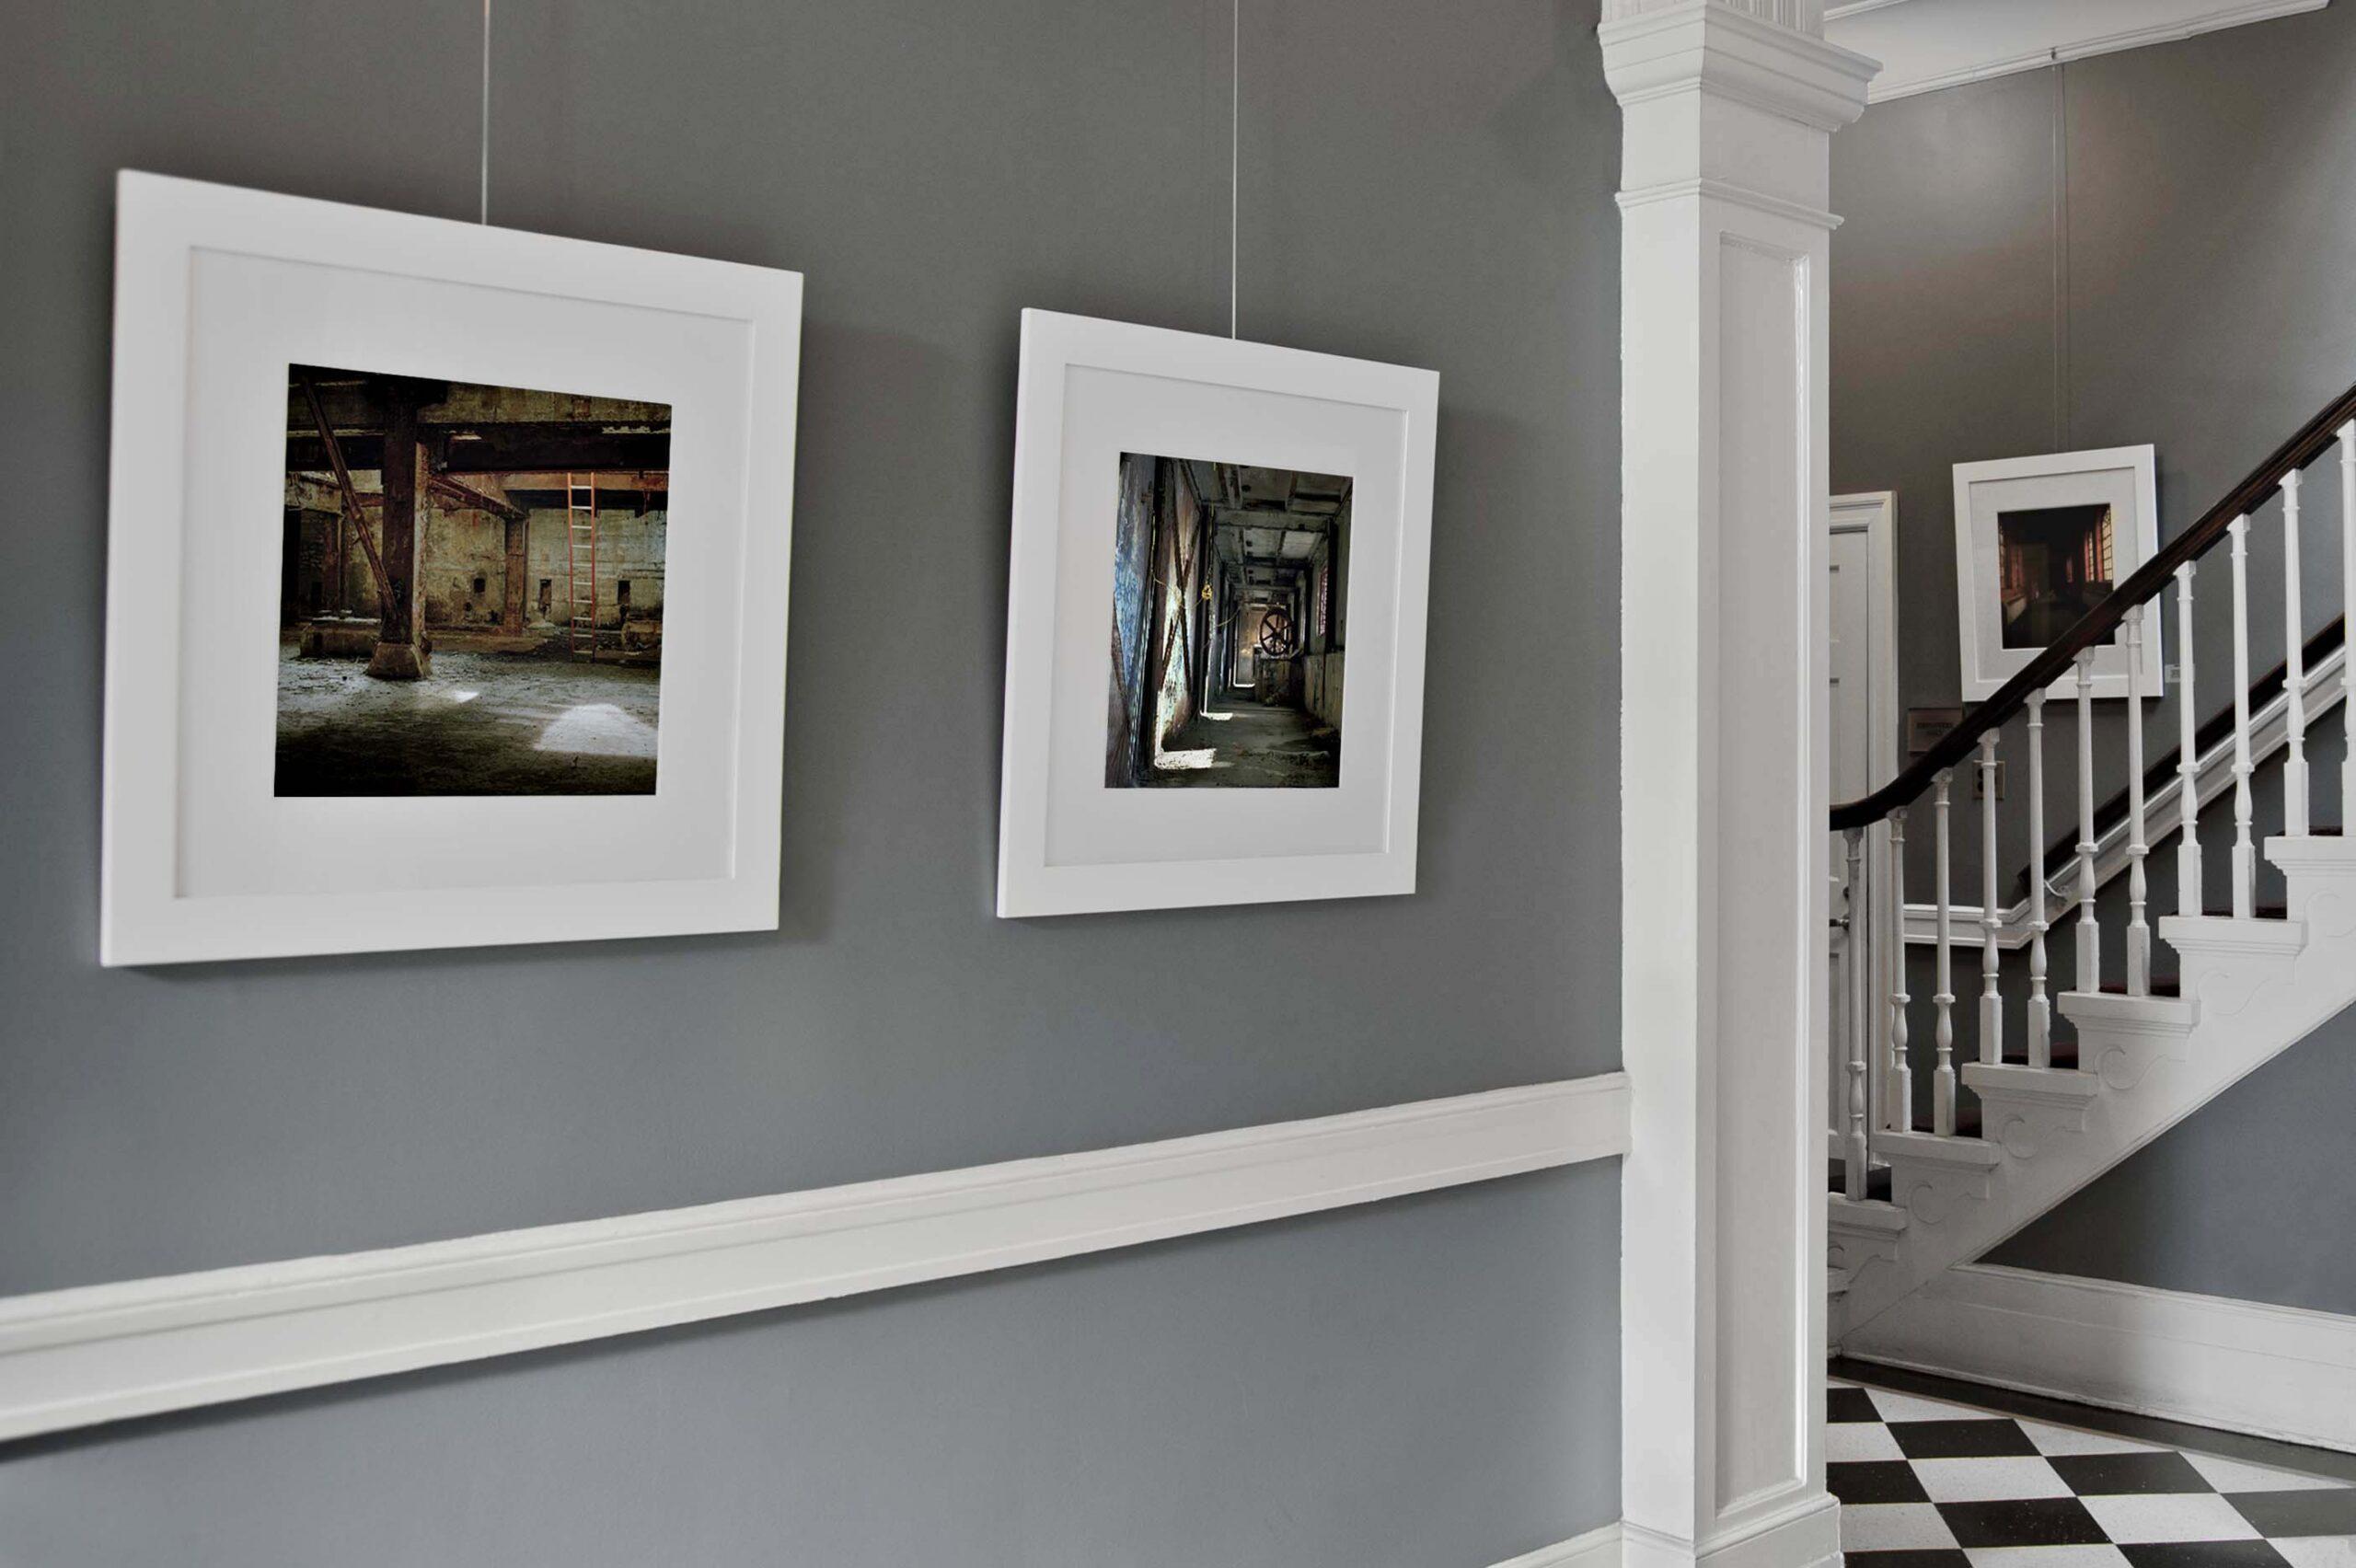 Trespass, Hastings On Hudson Arts Commission